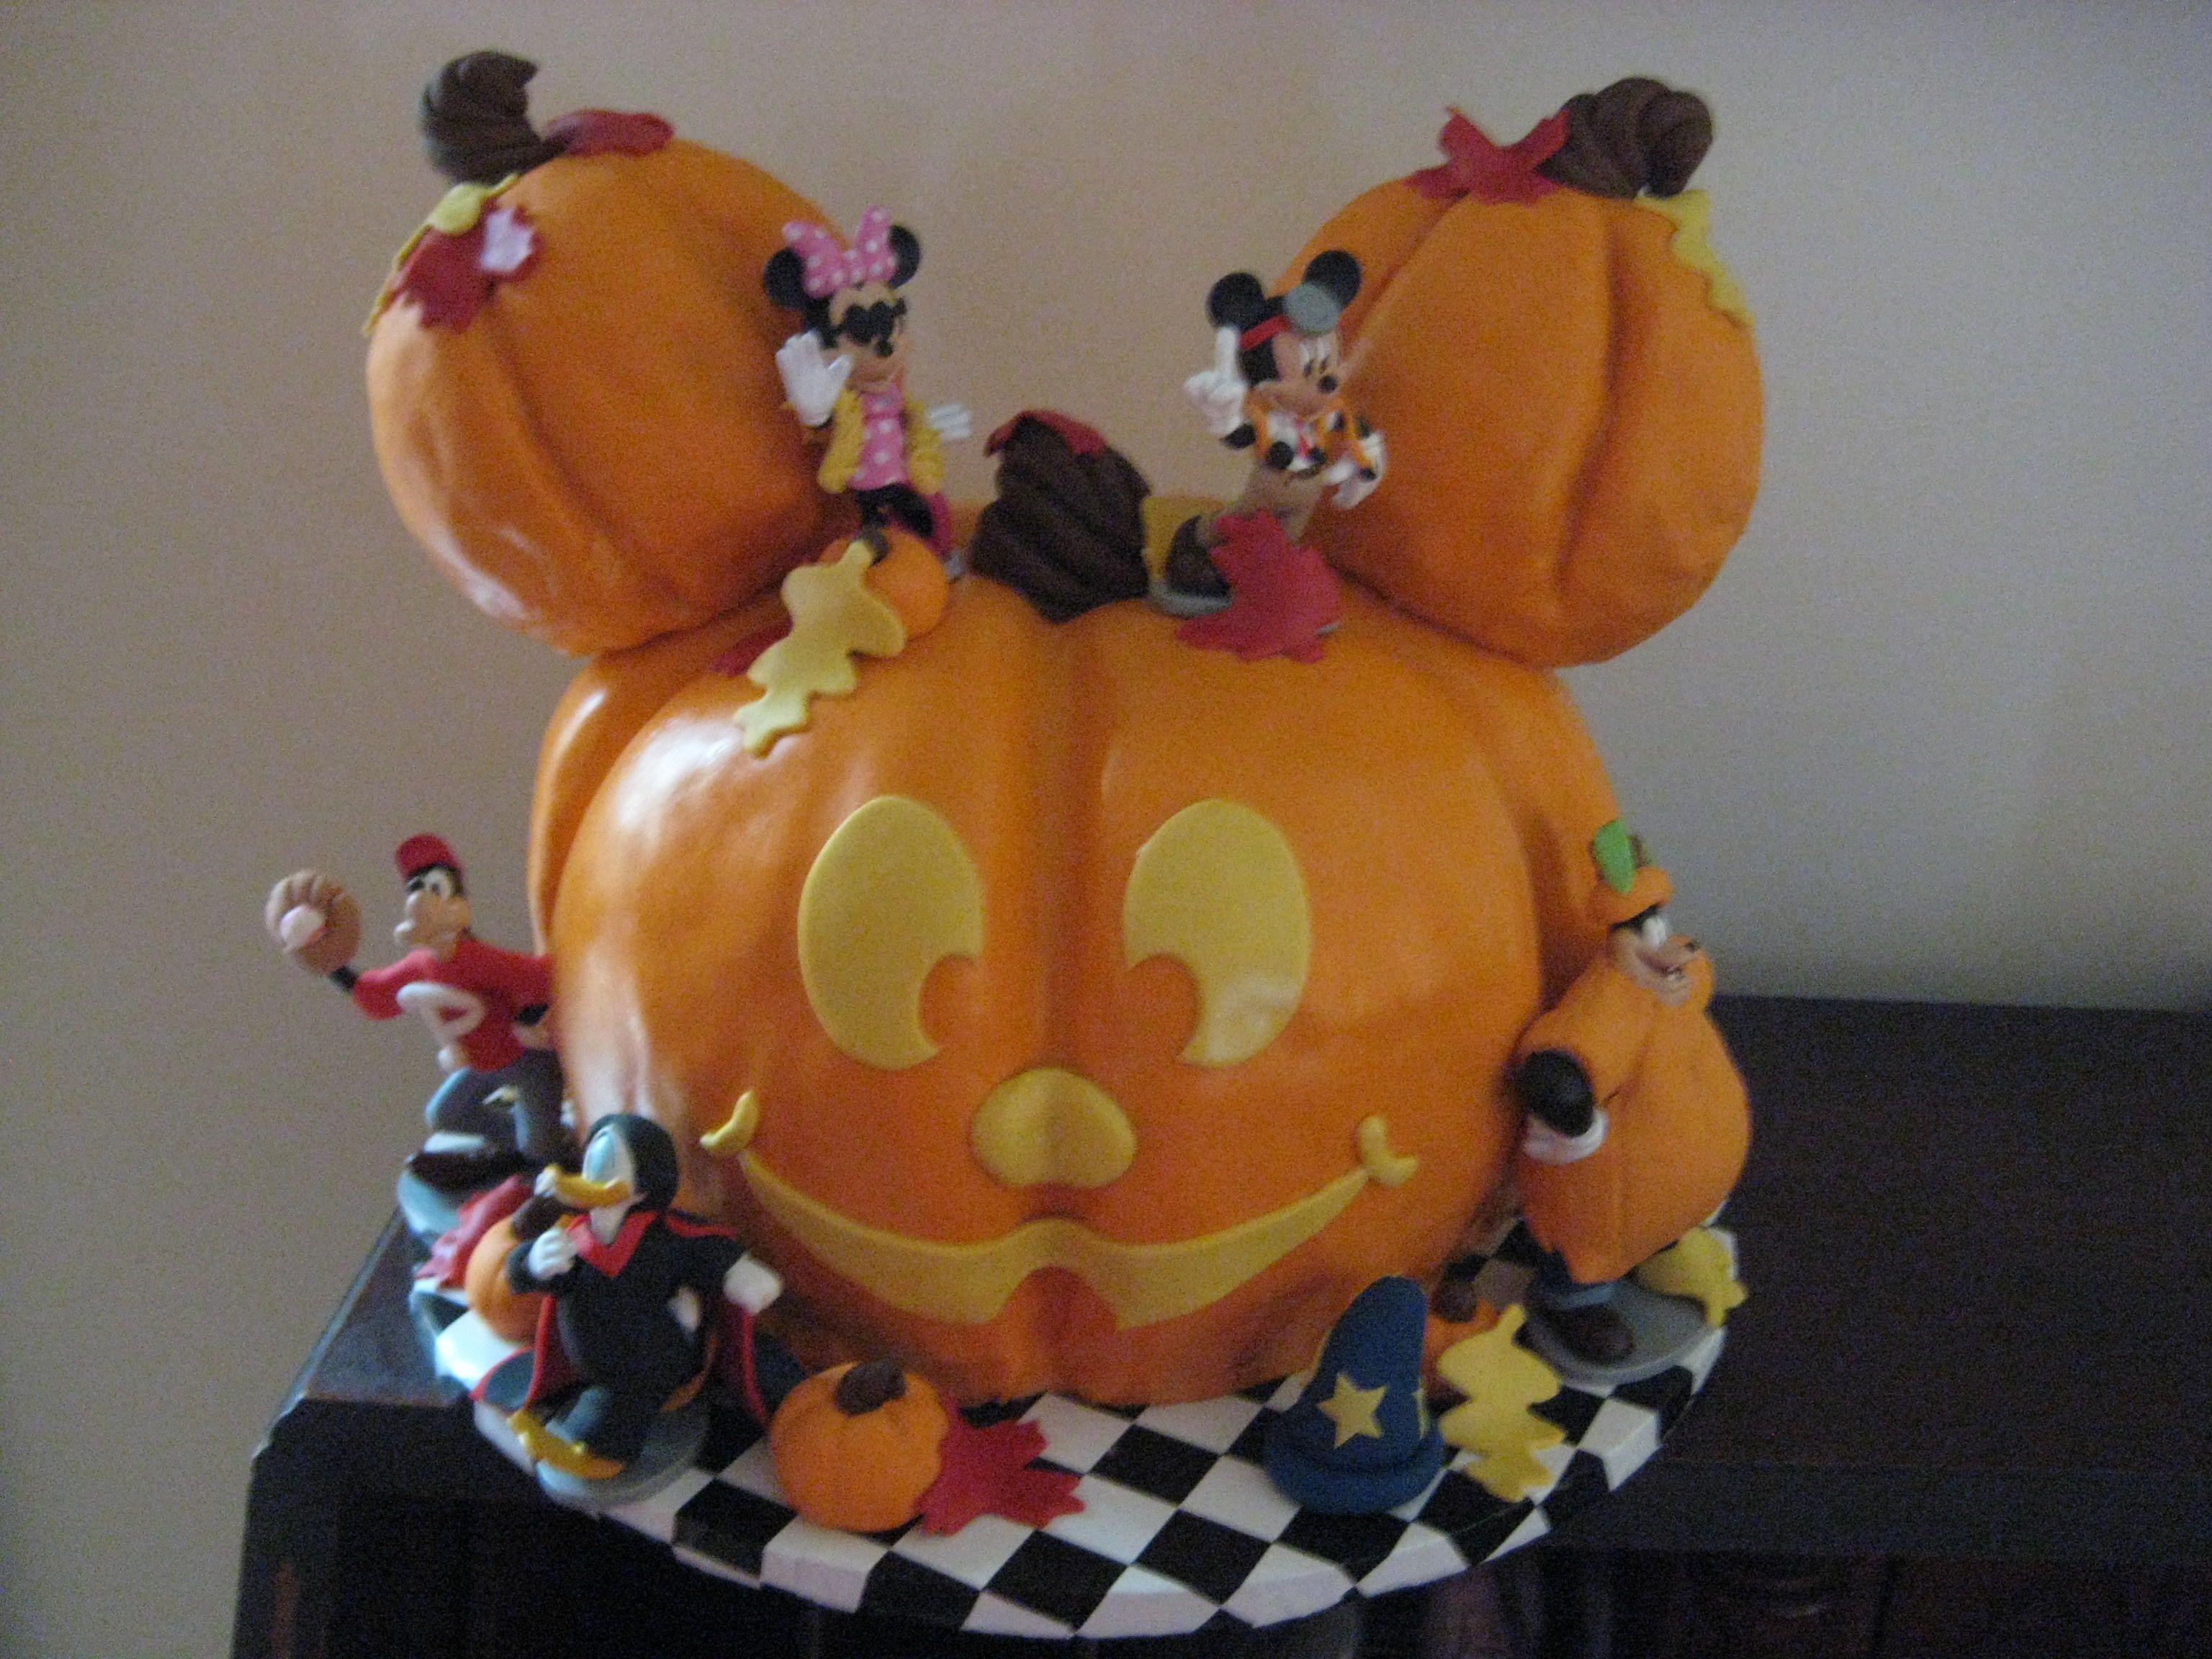 Sculpture cakes | saveyourforkcakes